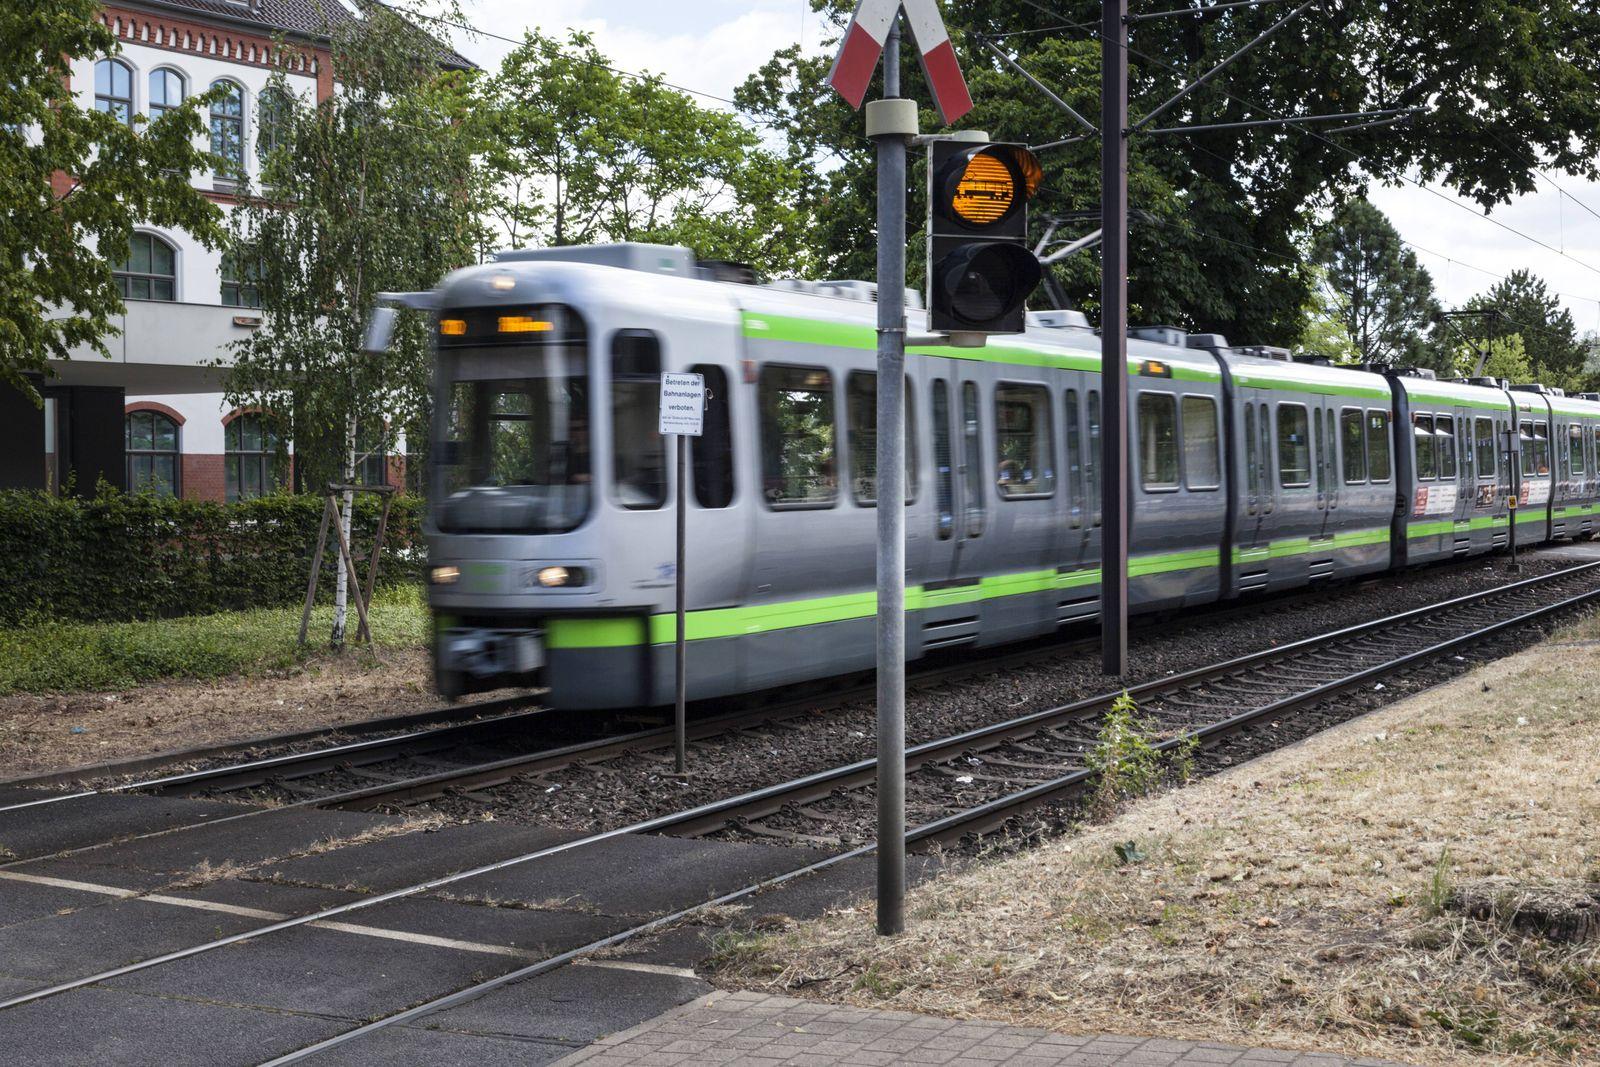 Straßenbahn in Hannover *** Tram in Hannover